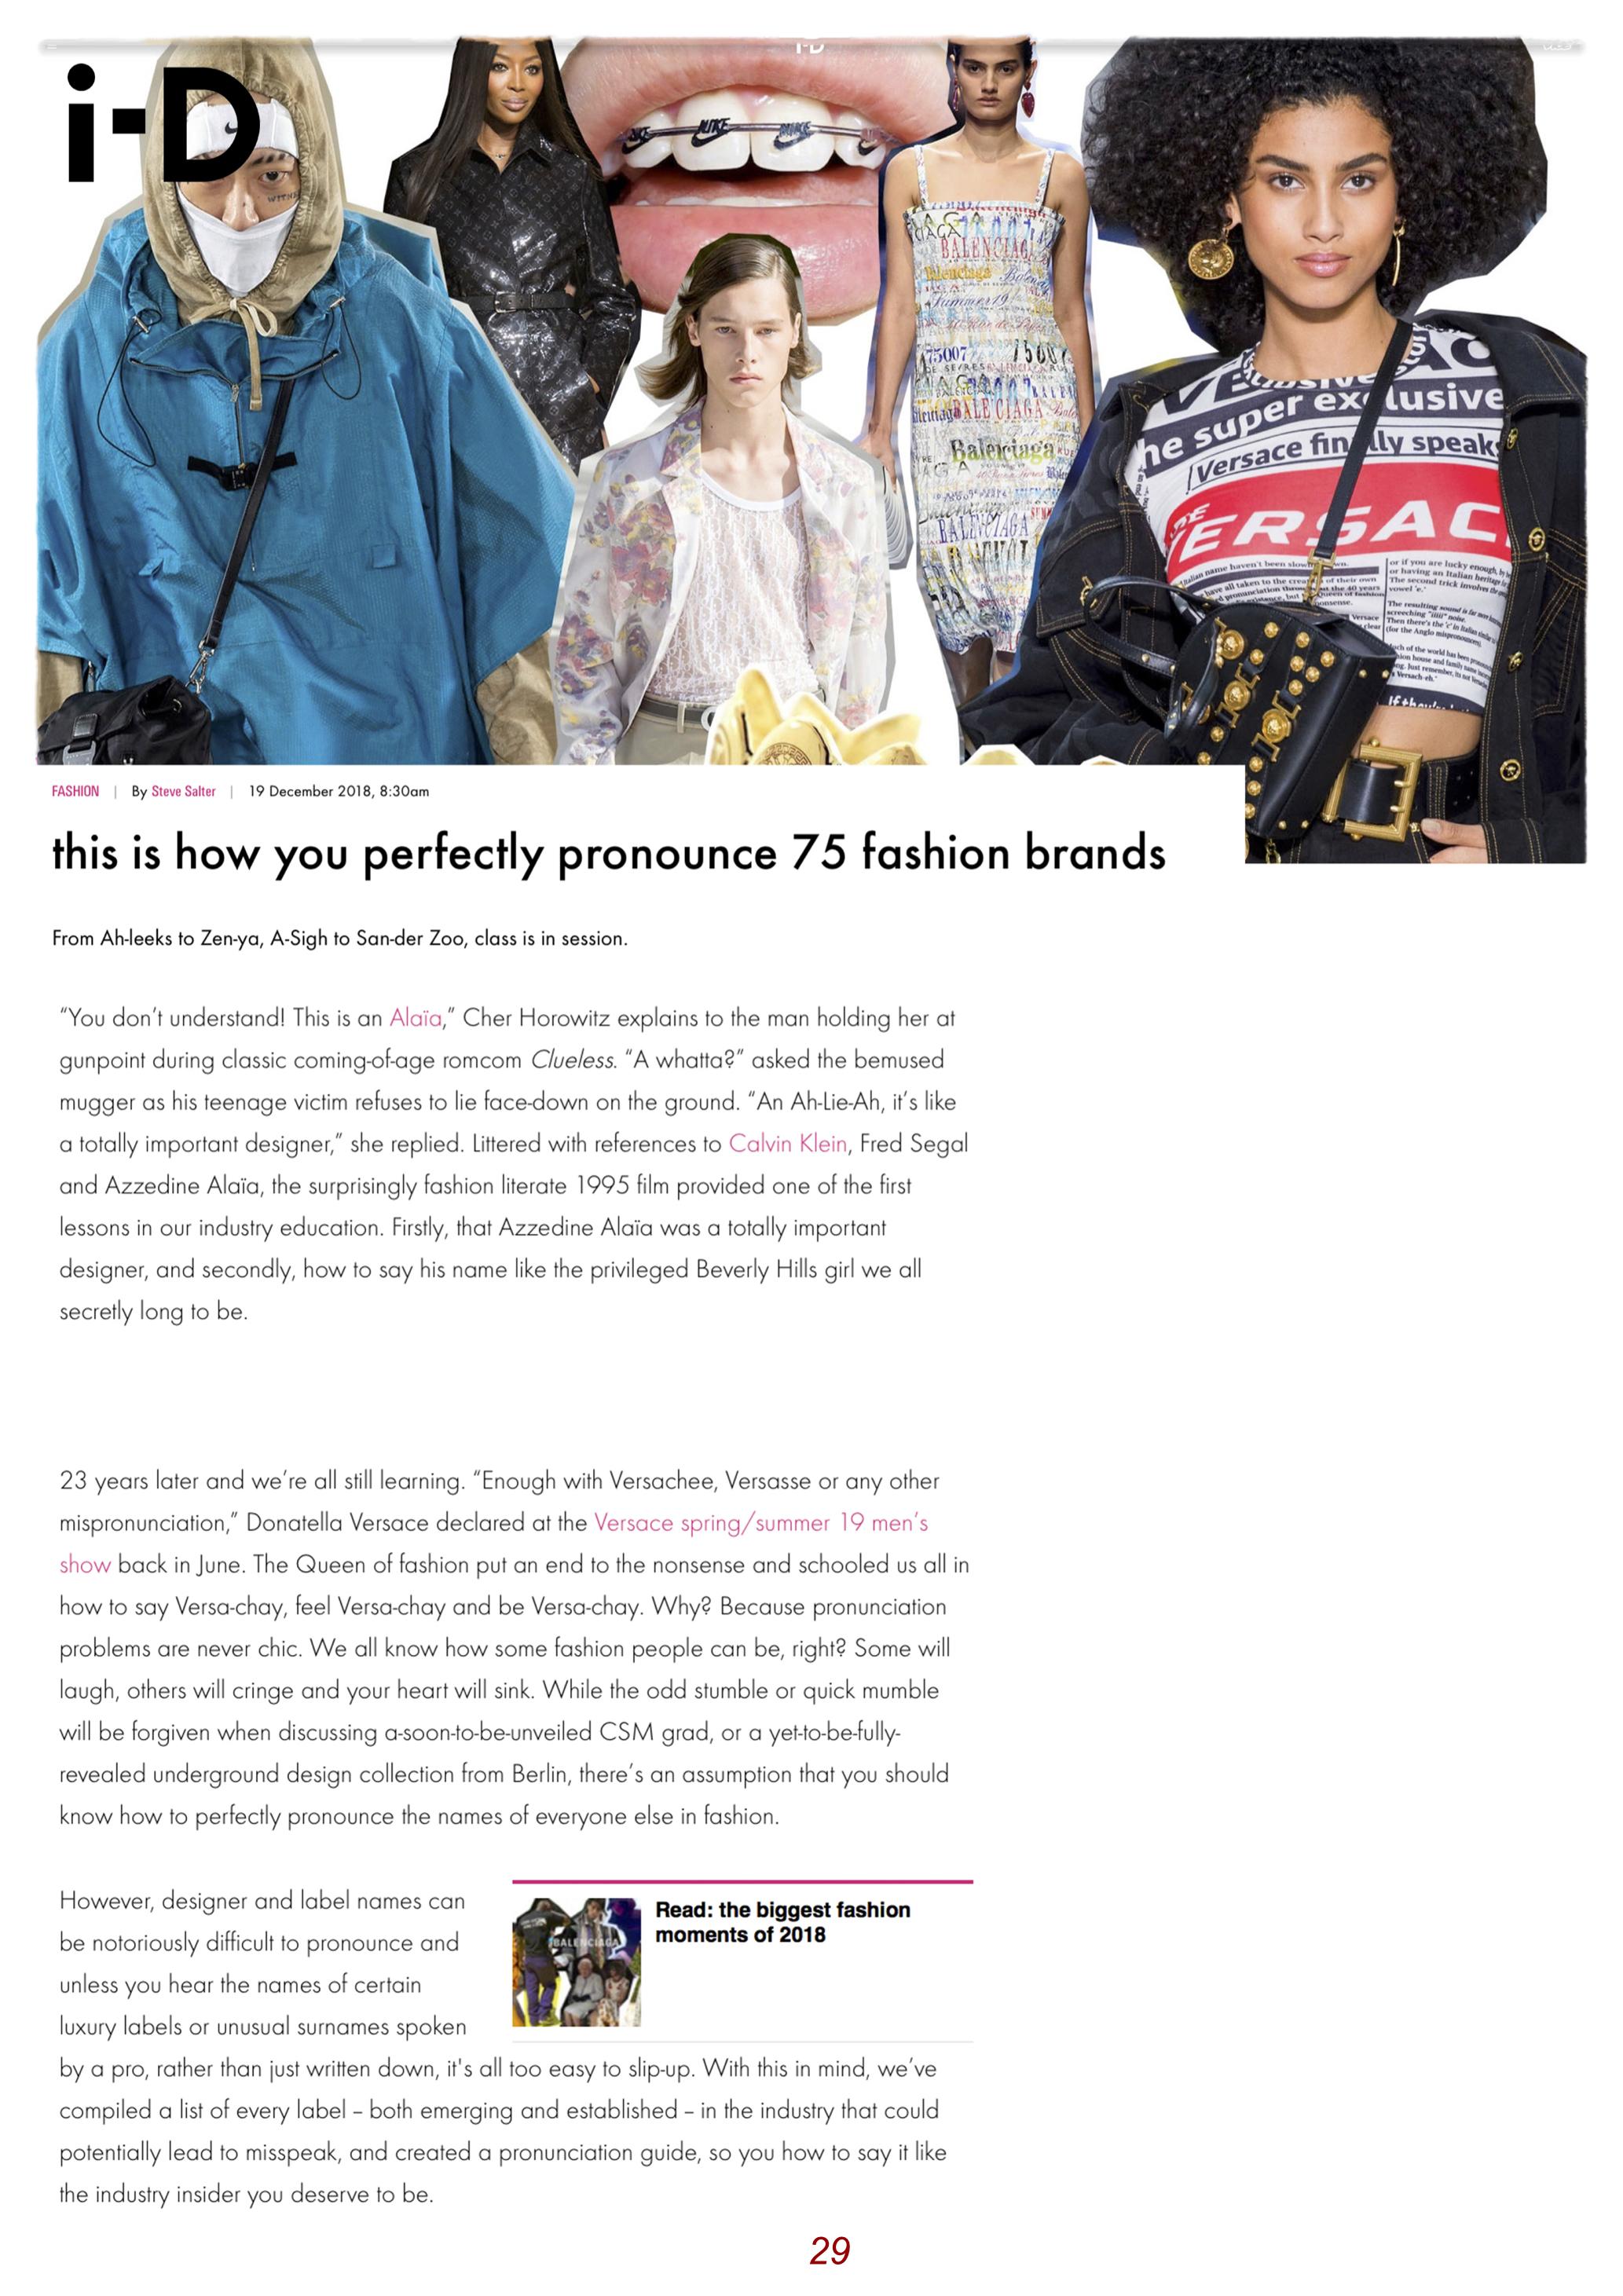 PAGE 29 photo.jpg